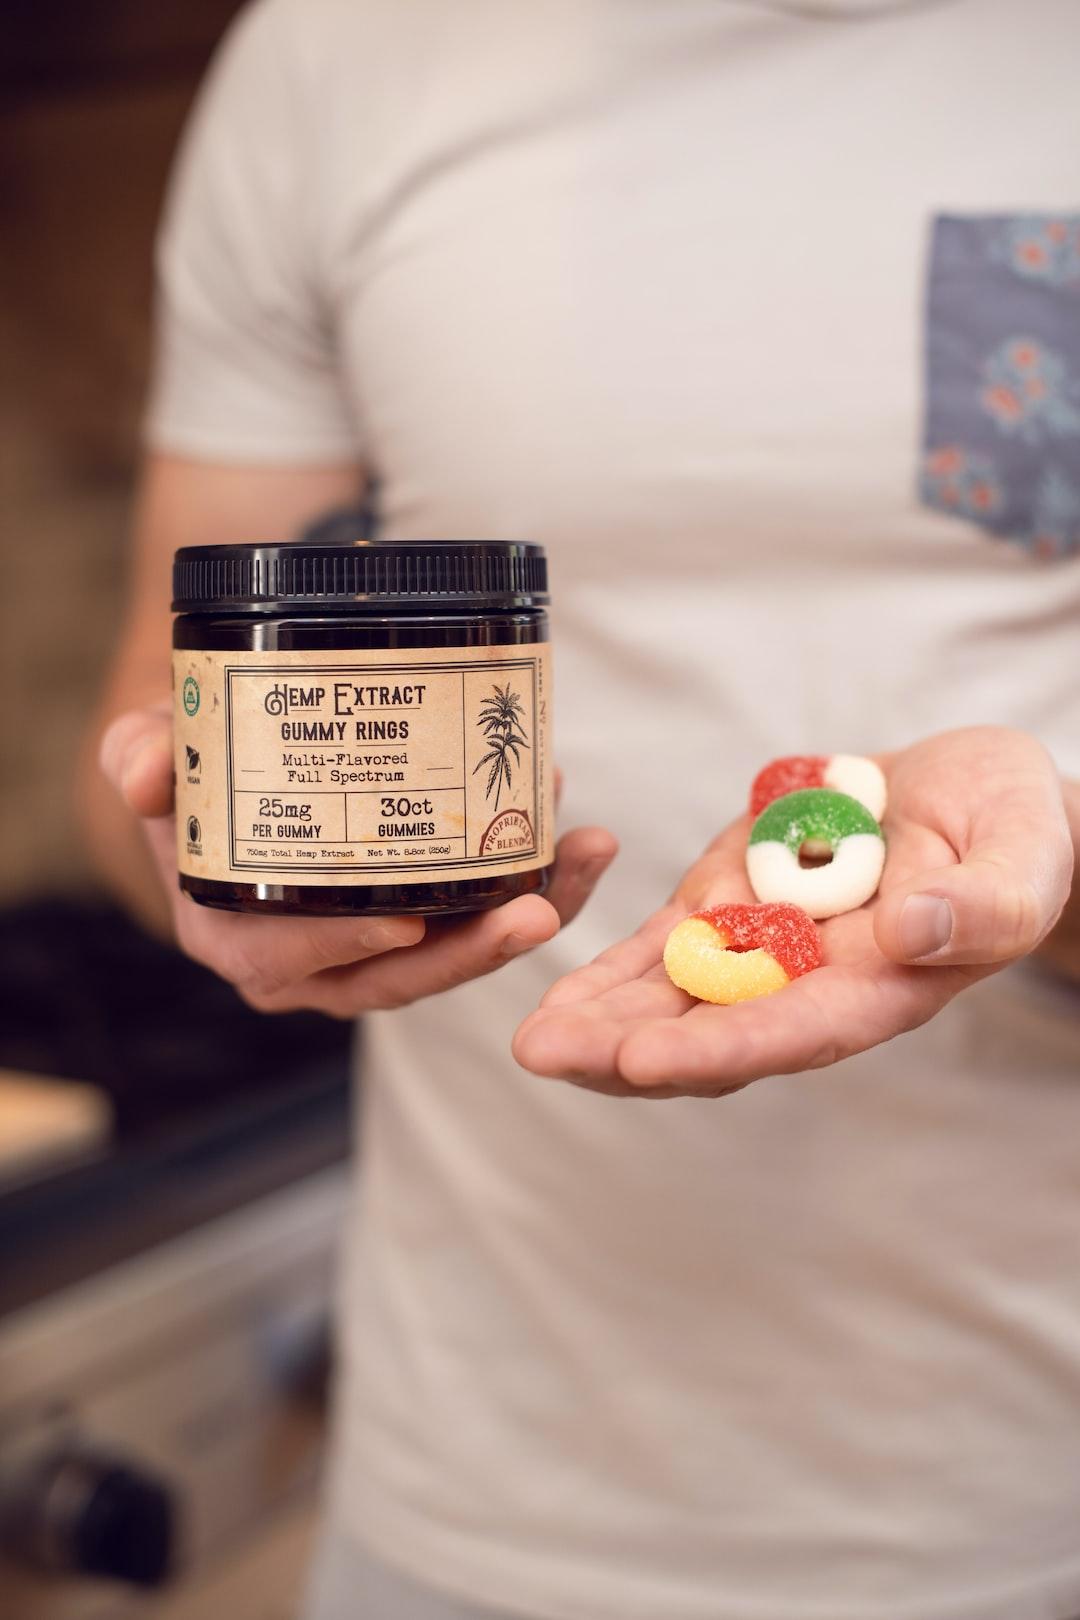 Colorado man holding jar of hemp extract gummies edible candy